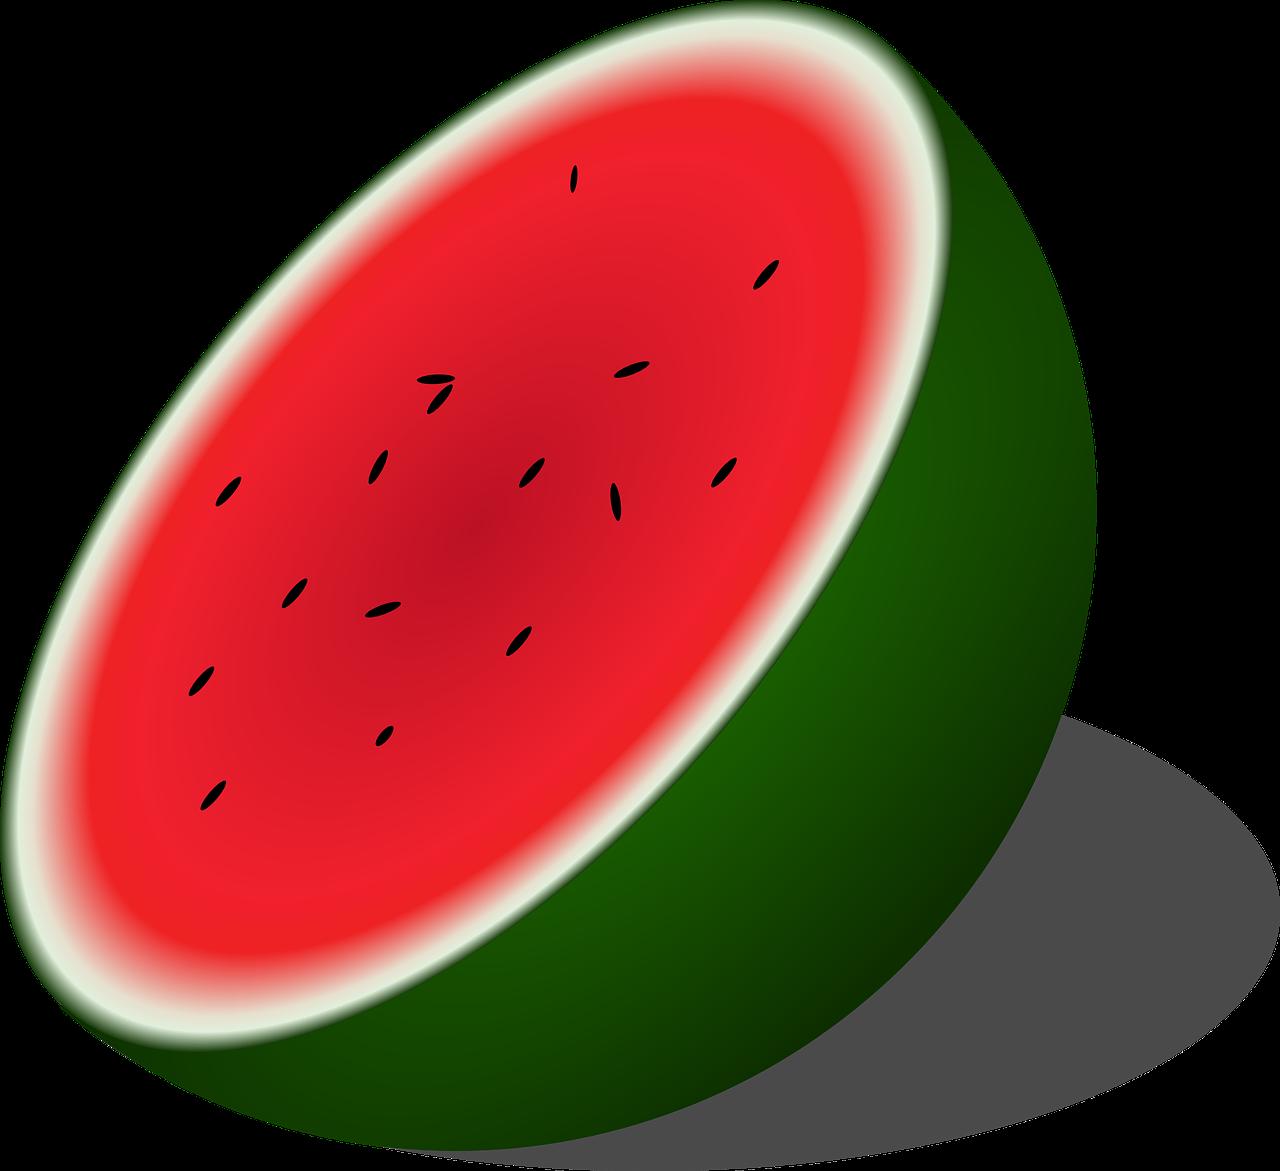 Half of a watermelon